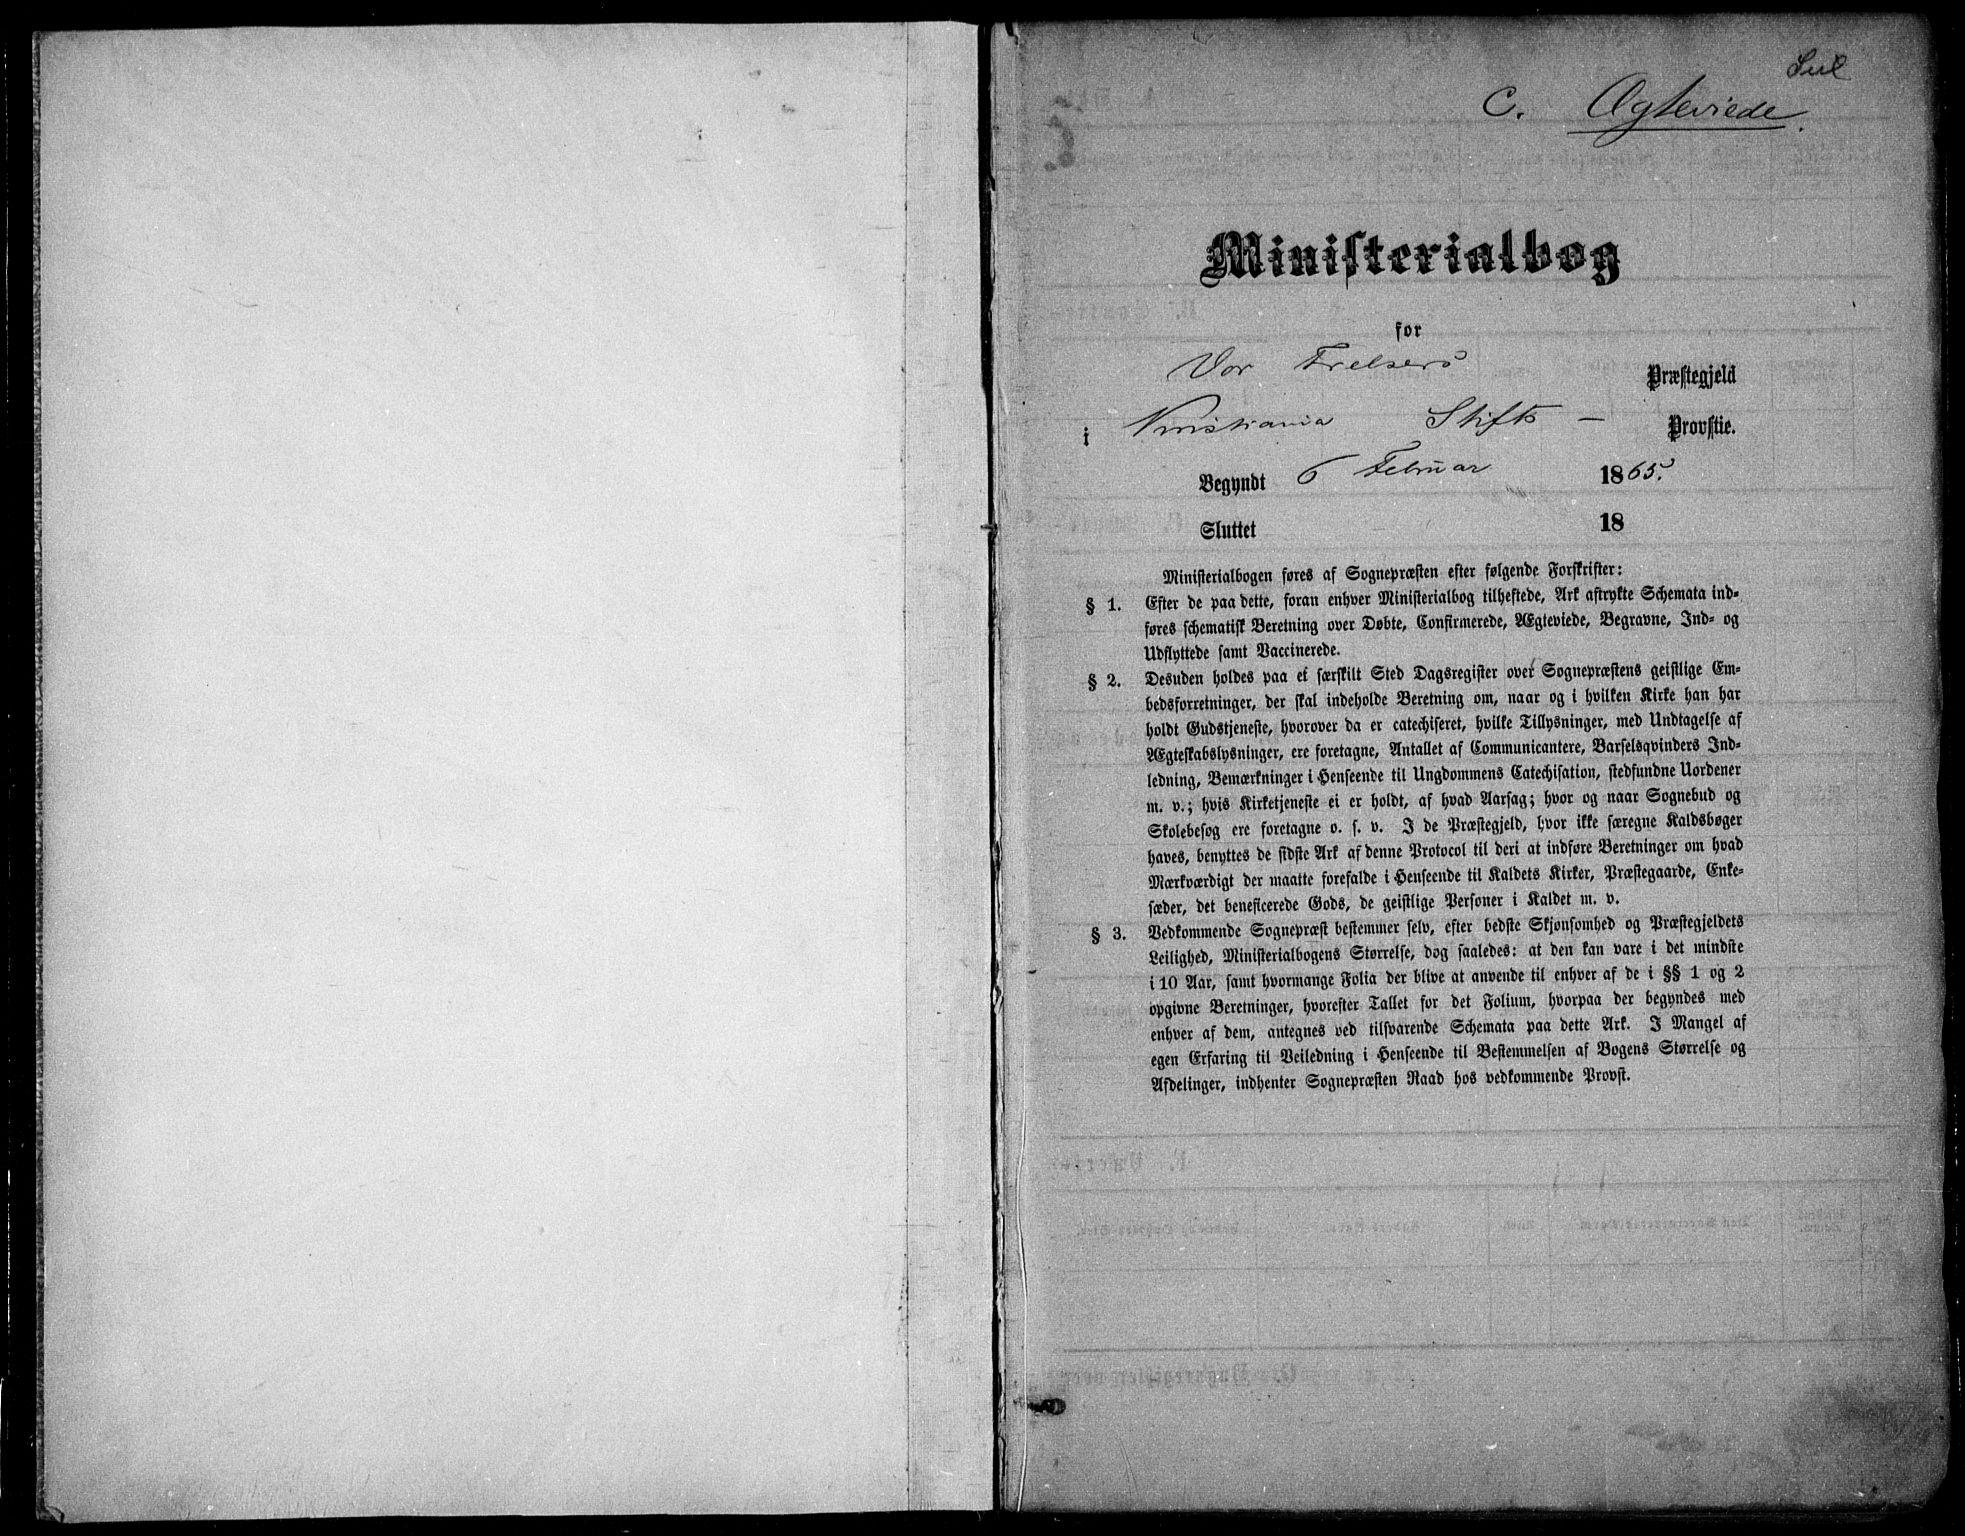 SAO, Oslo domkirke Kirkebøker, F/Fa/L0021: Ministerialbok nr. 21, 1865-1884